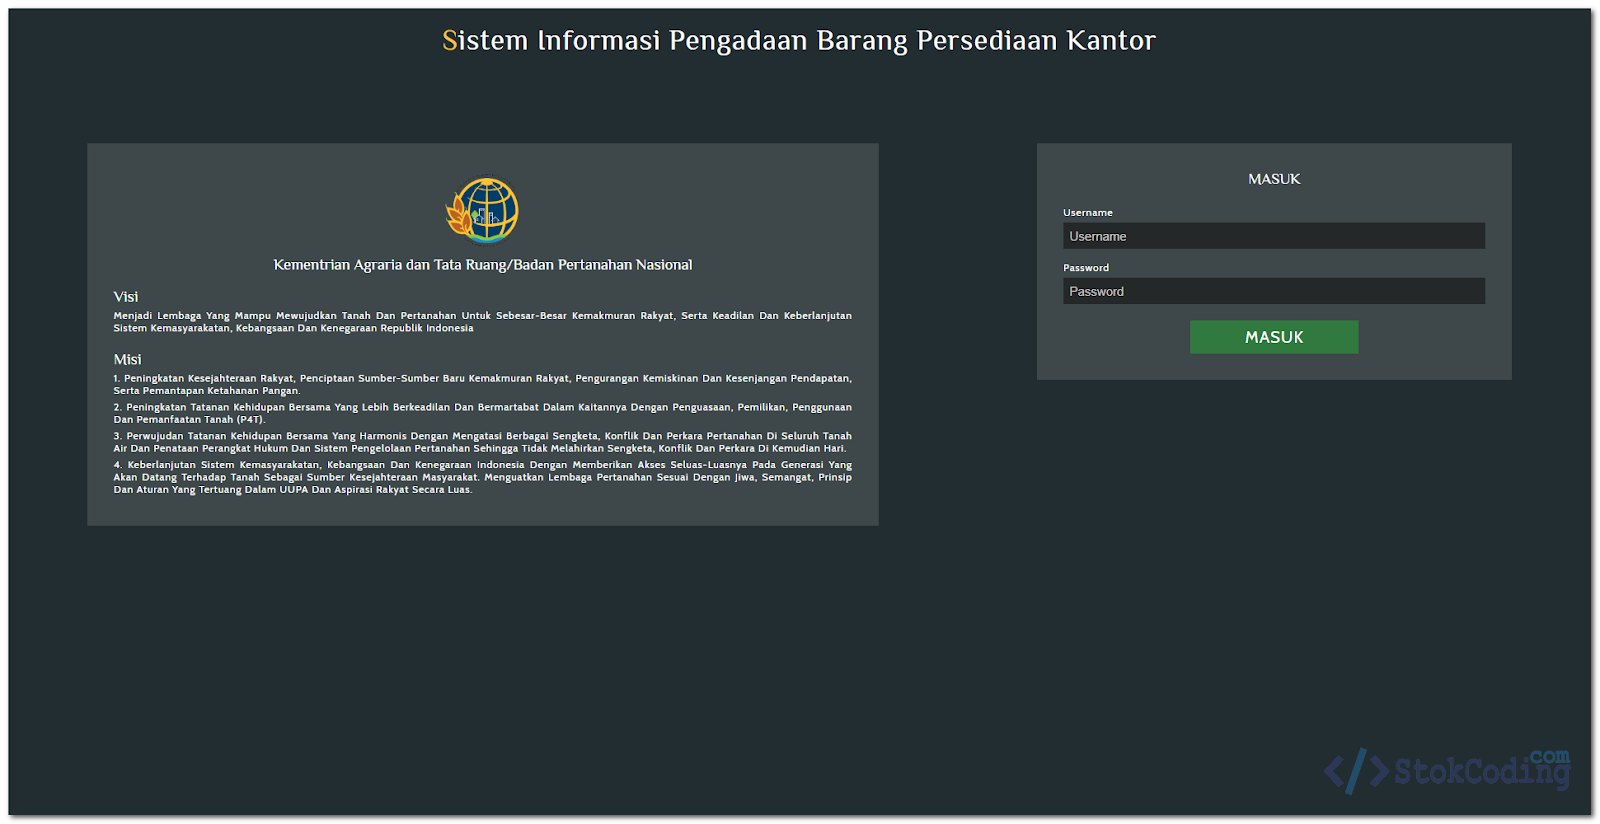 Sistem Informasi Pengadaan Barang Kantor (Codeigniter)